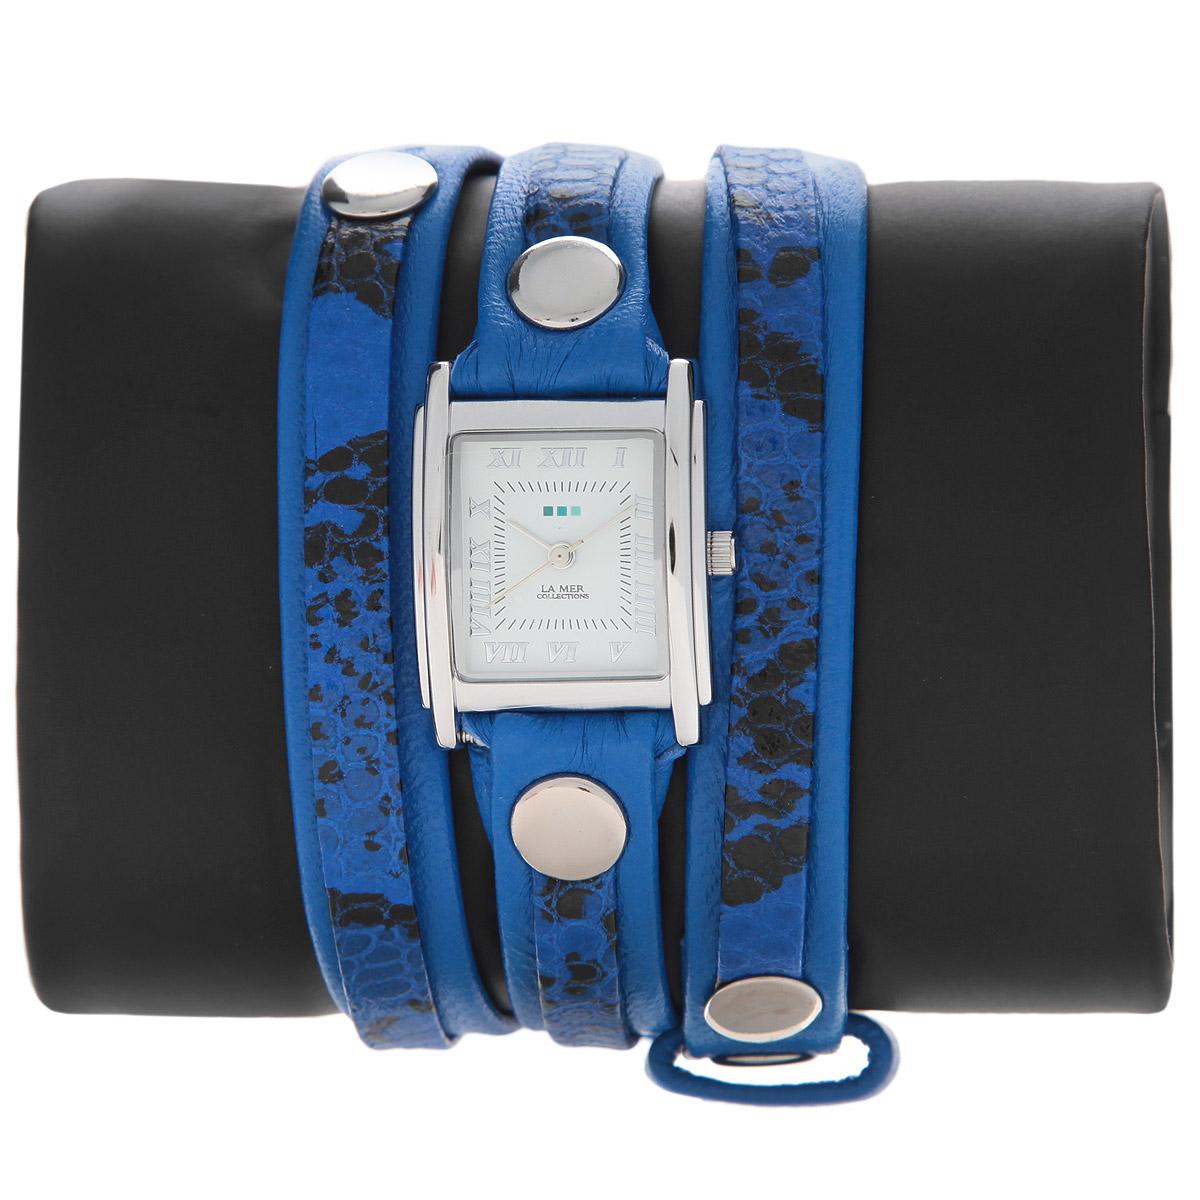 "Часы наручные женские La Mer Collections ""Layer Electric Blue Snake"". LMLW6001x ( LMLW6001x )"